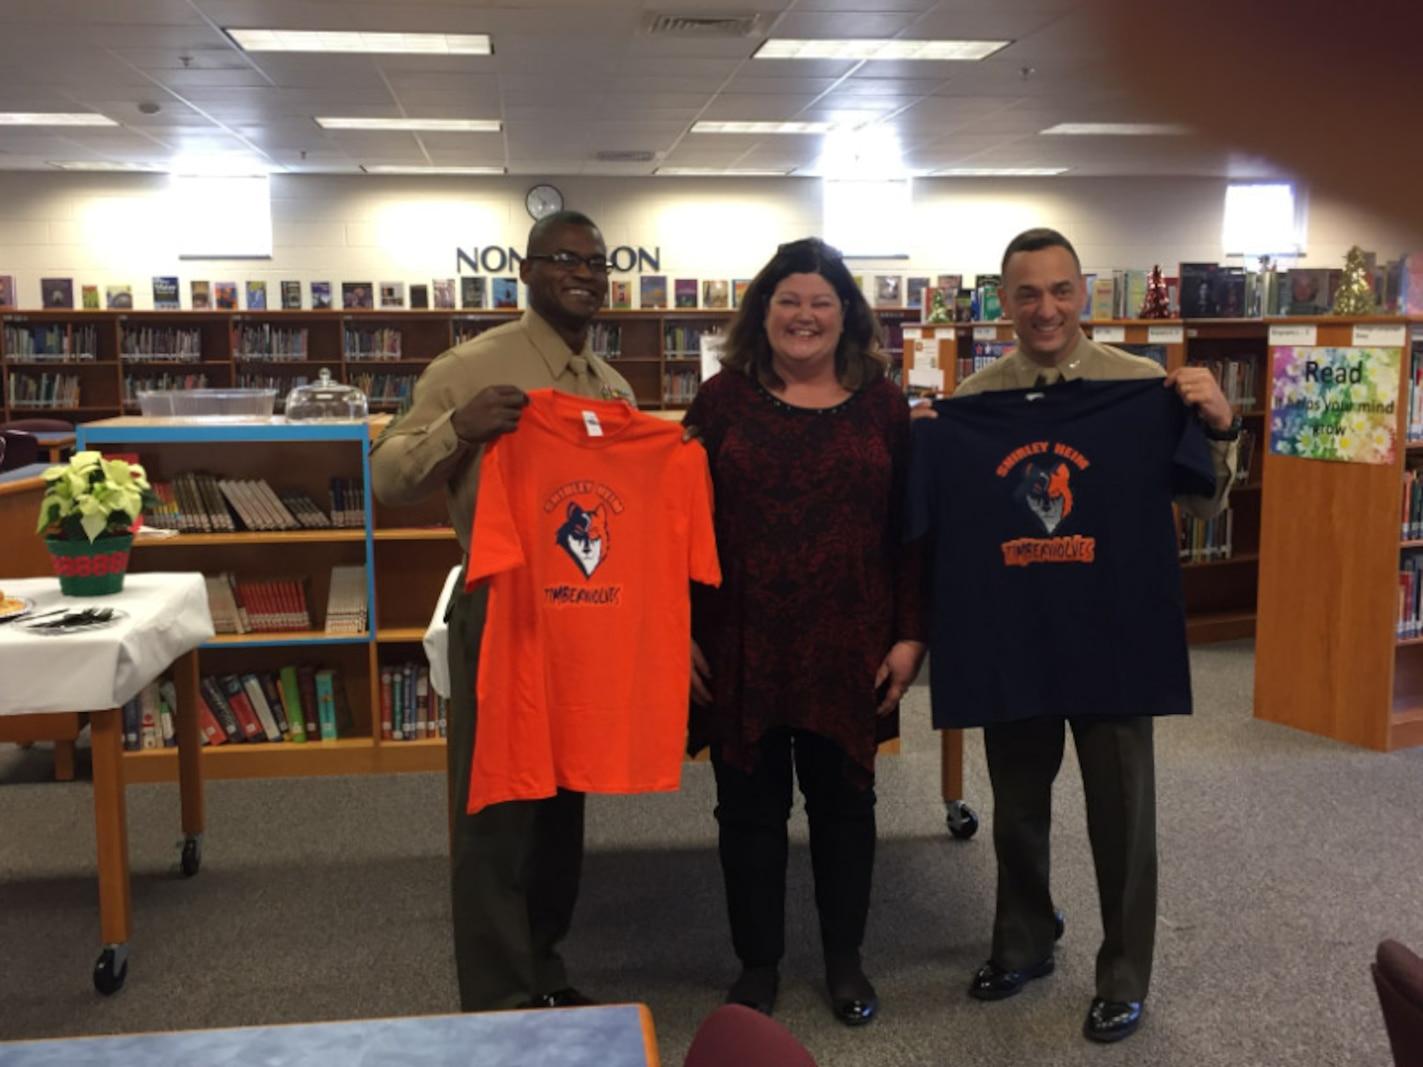 Col Murray and SgtMaj Williams kick off the Adopt-A-School Program at Shirley Heim Middle School.